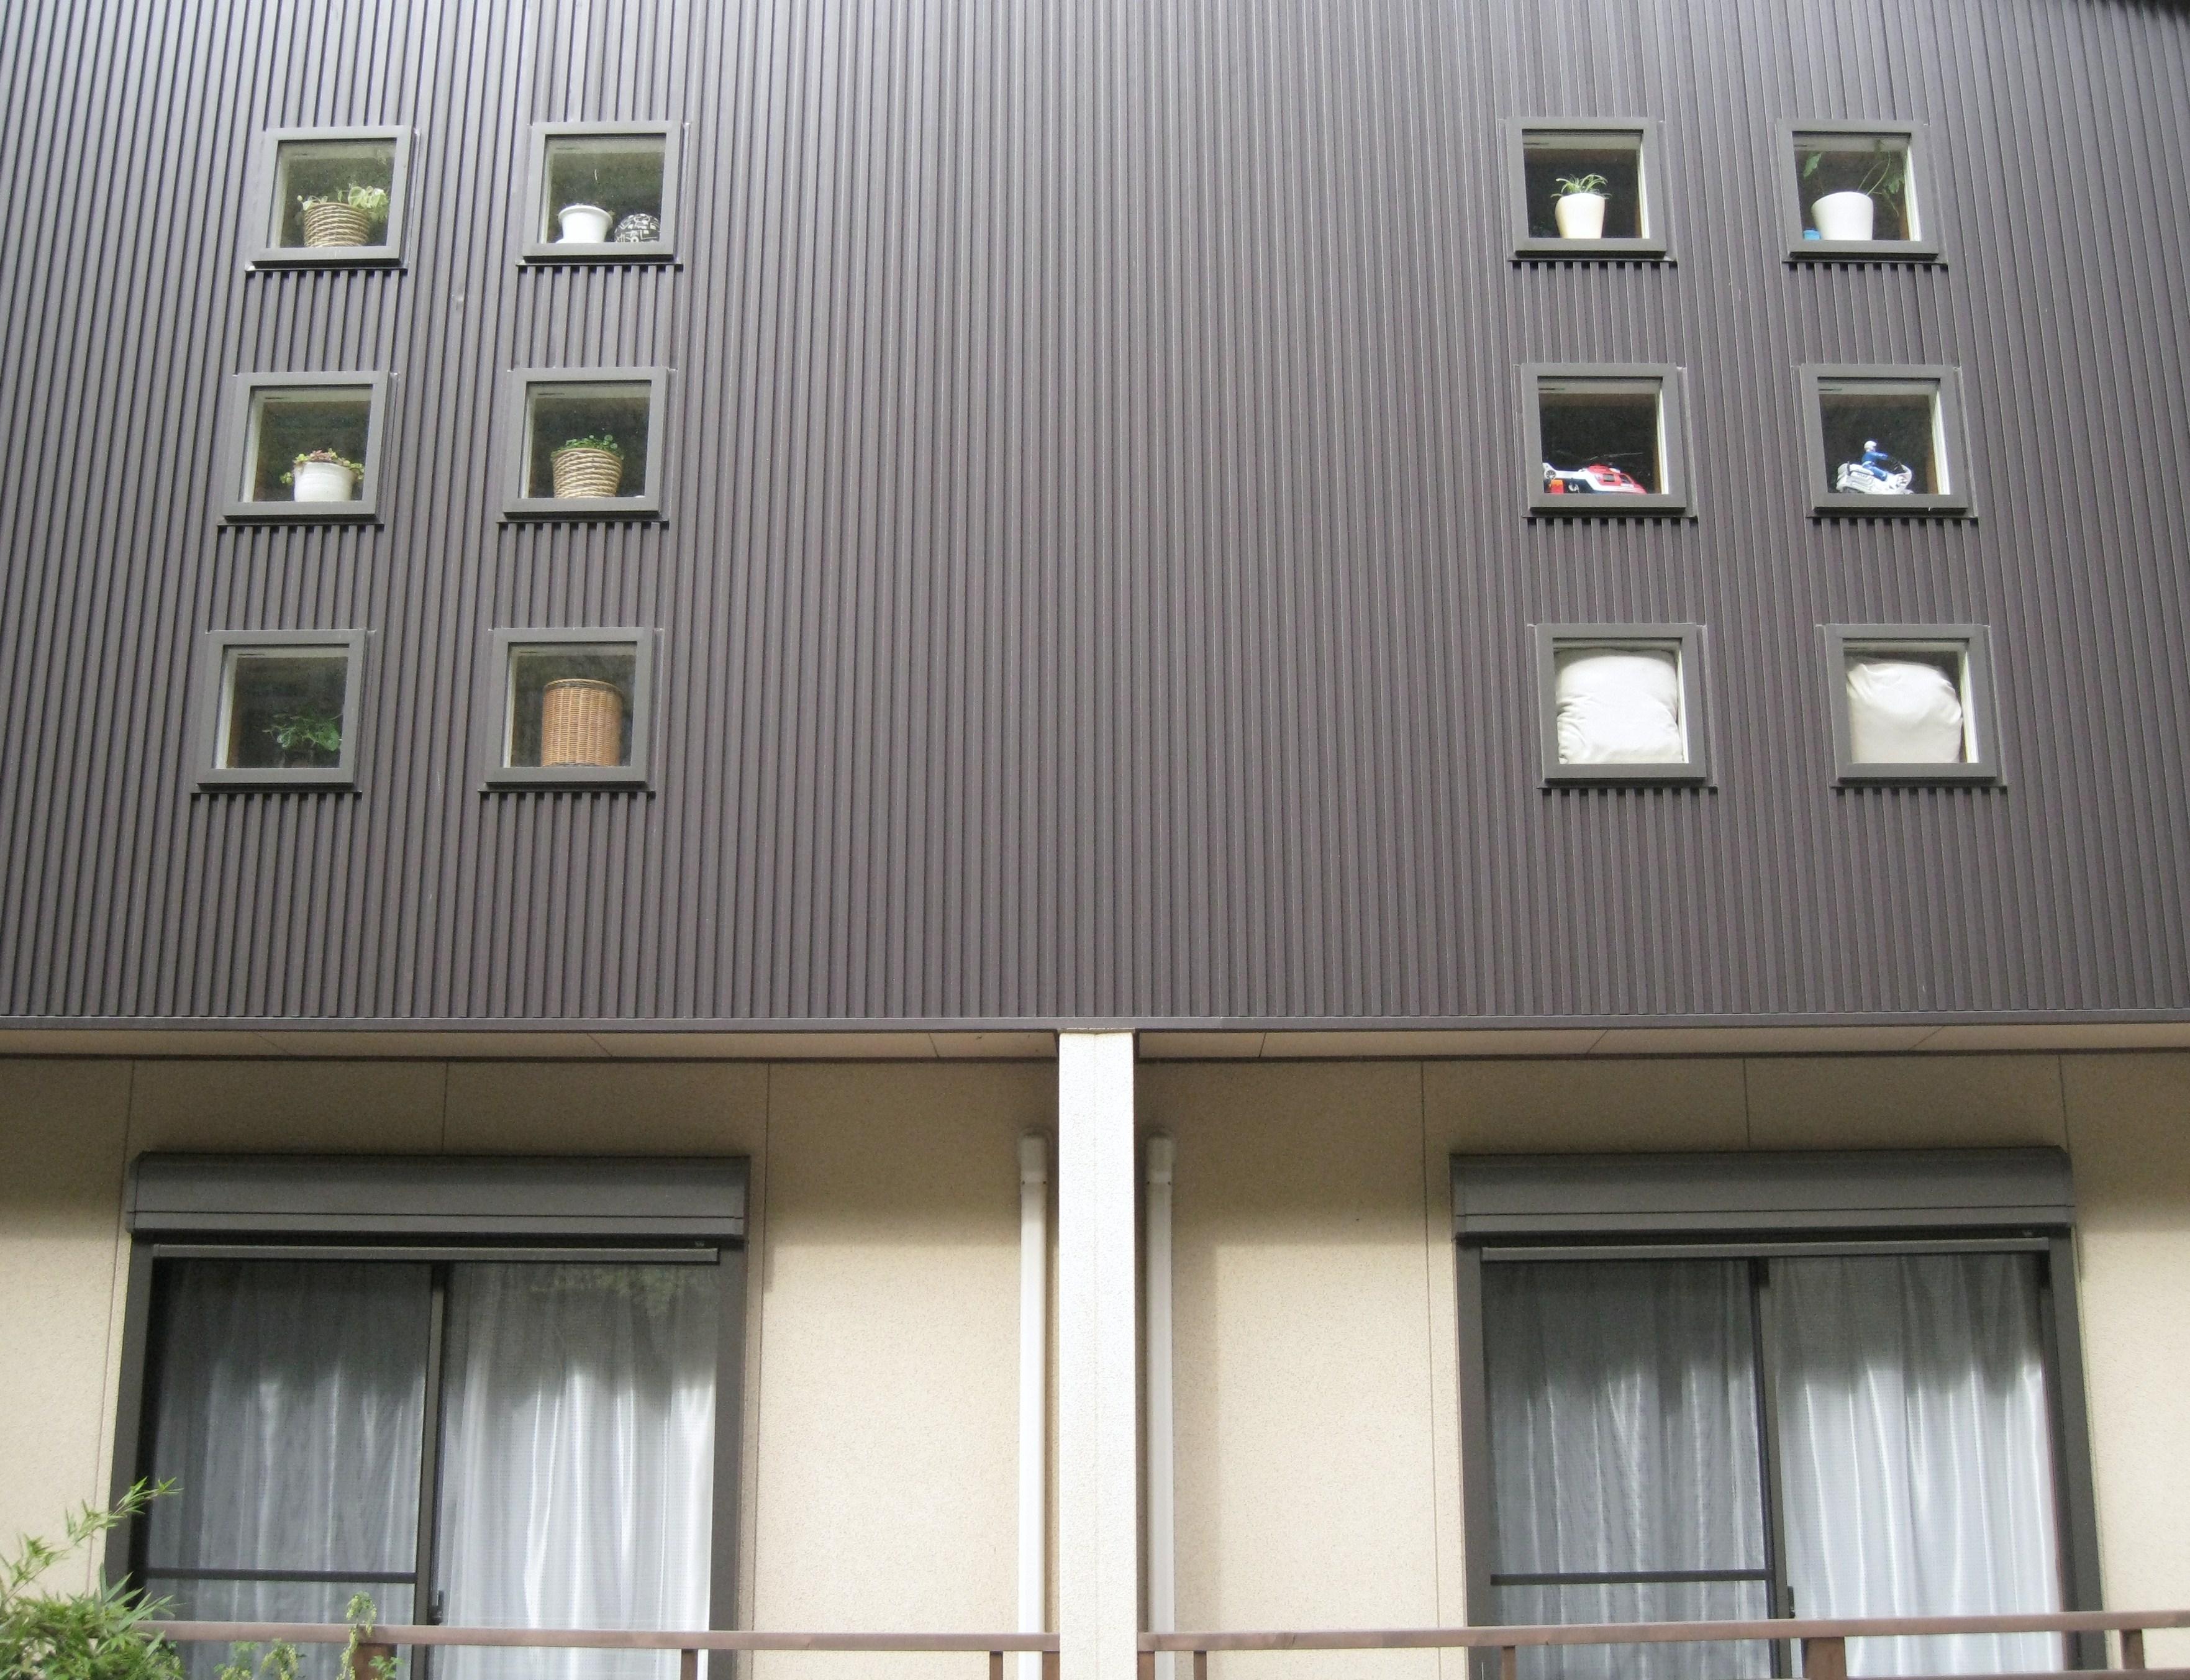 Sex window next apartment